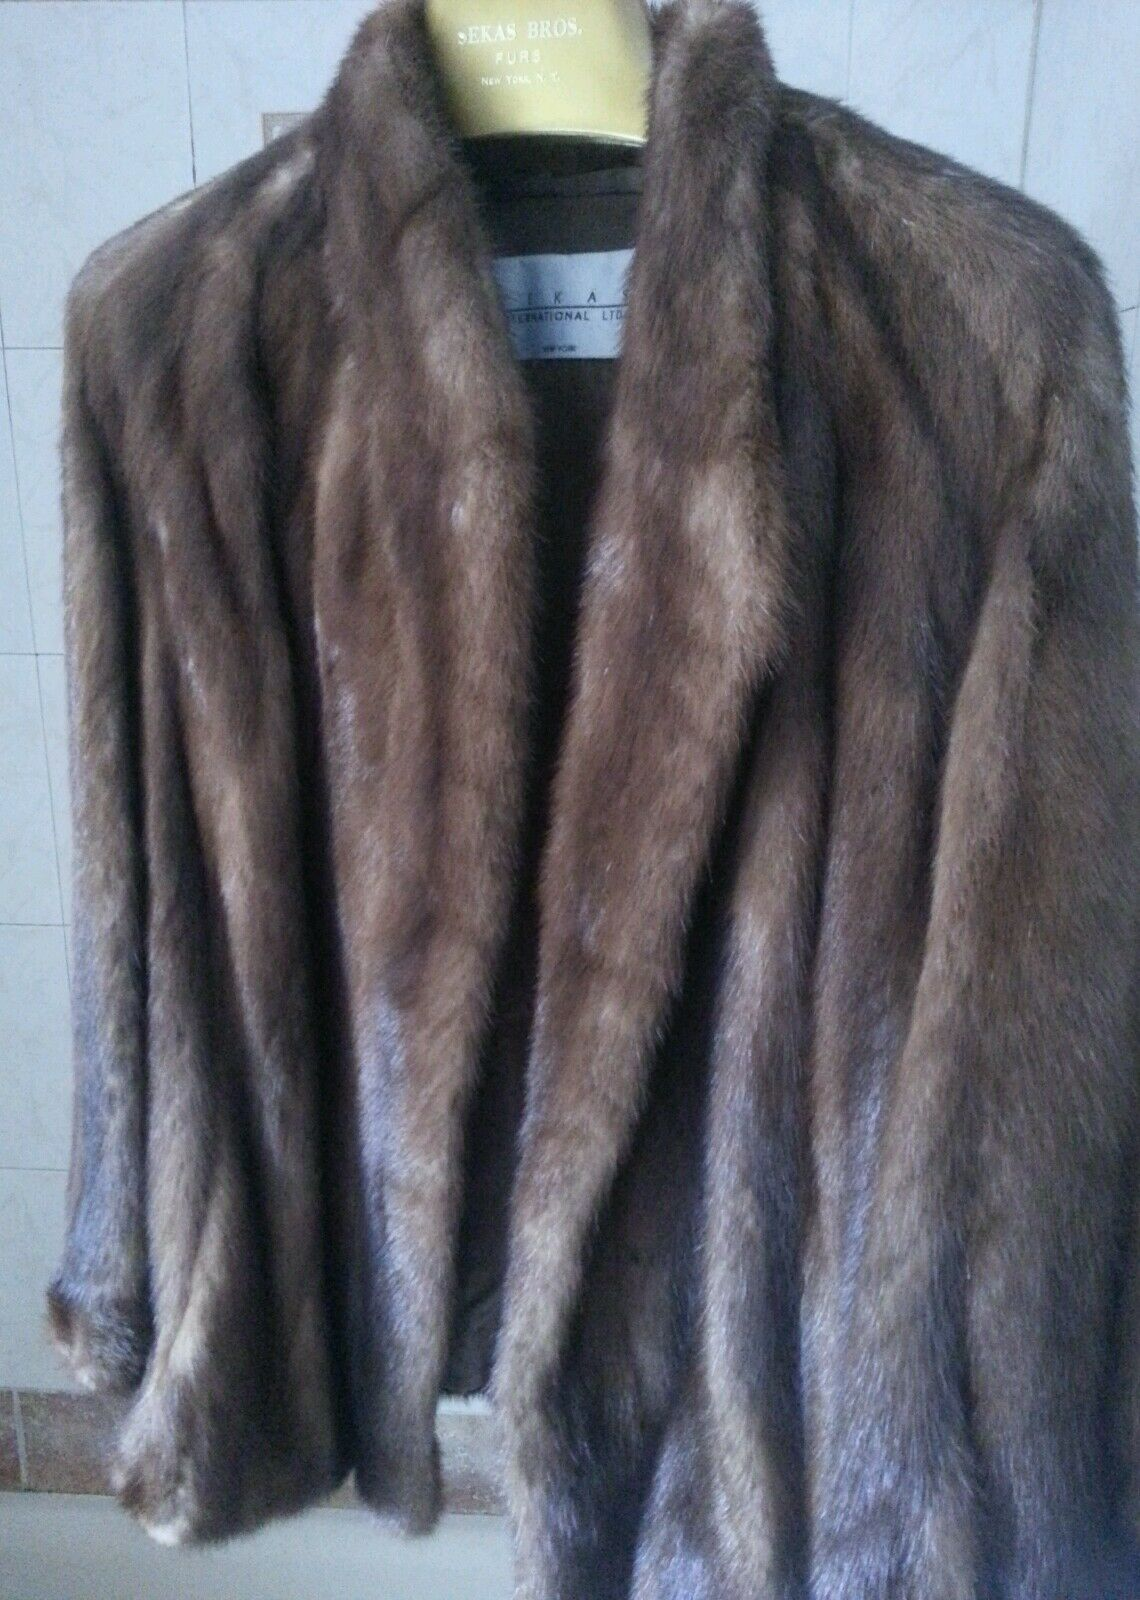 Sekas International Ltd. Limited Real Fur Coat